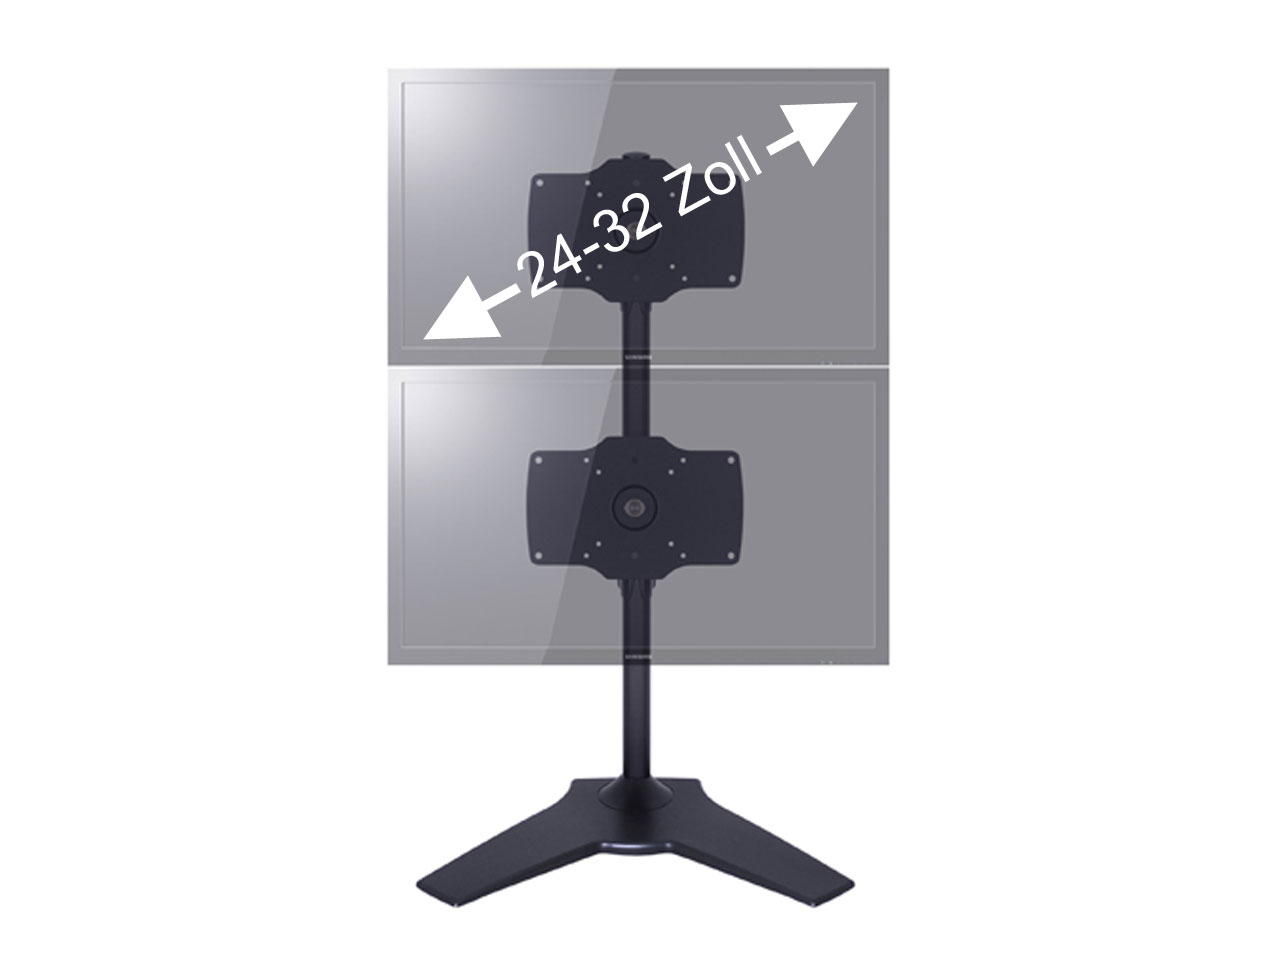 tv tischhalterung 2 bildschirme bereinander 24 32 zoll. Black Bedroom Furniture Sets. Home Design Ideas